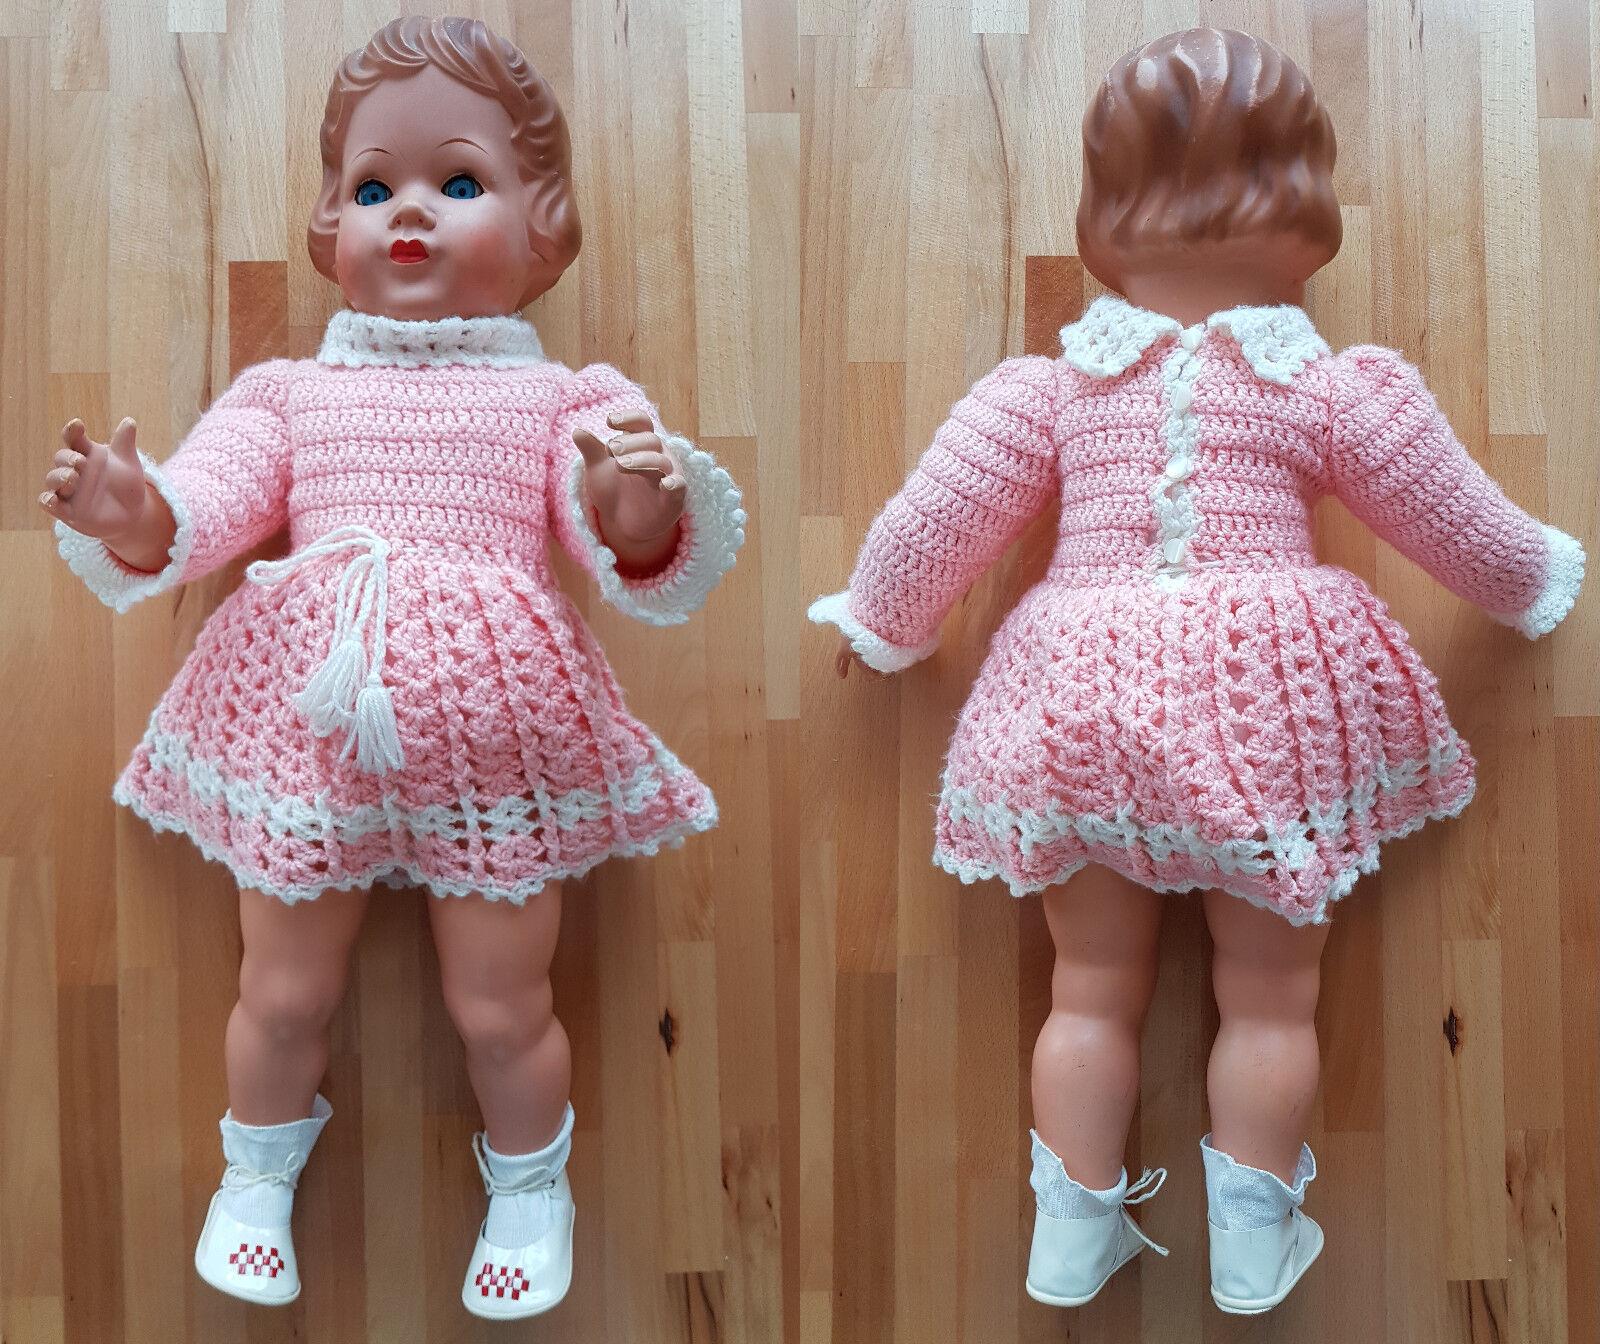 75 cm Puppe Püppchen Figur Doll Sammlung Sammler Kollektion Audio Geräusche